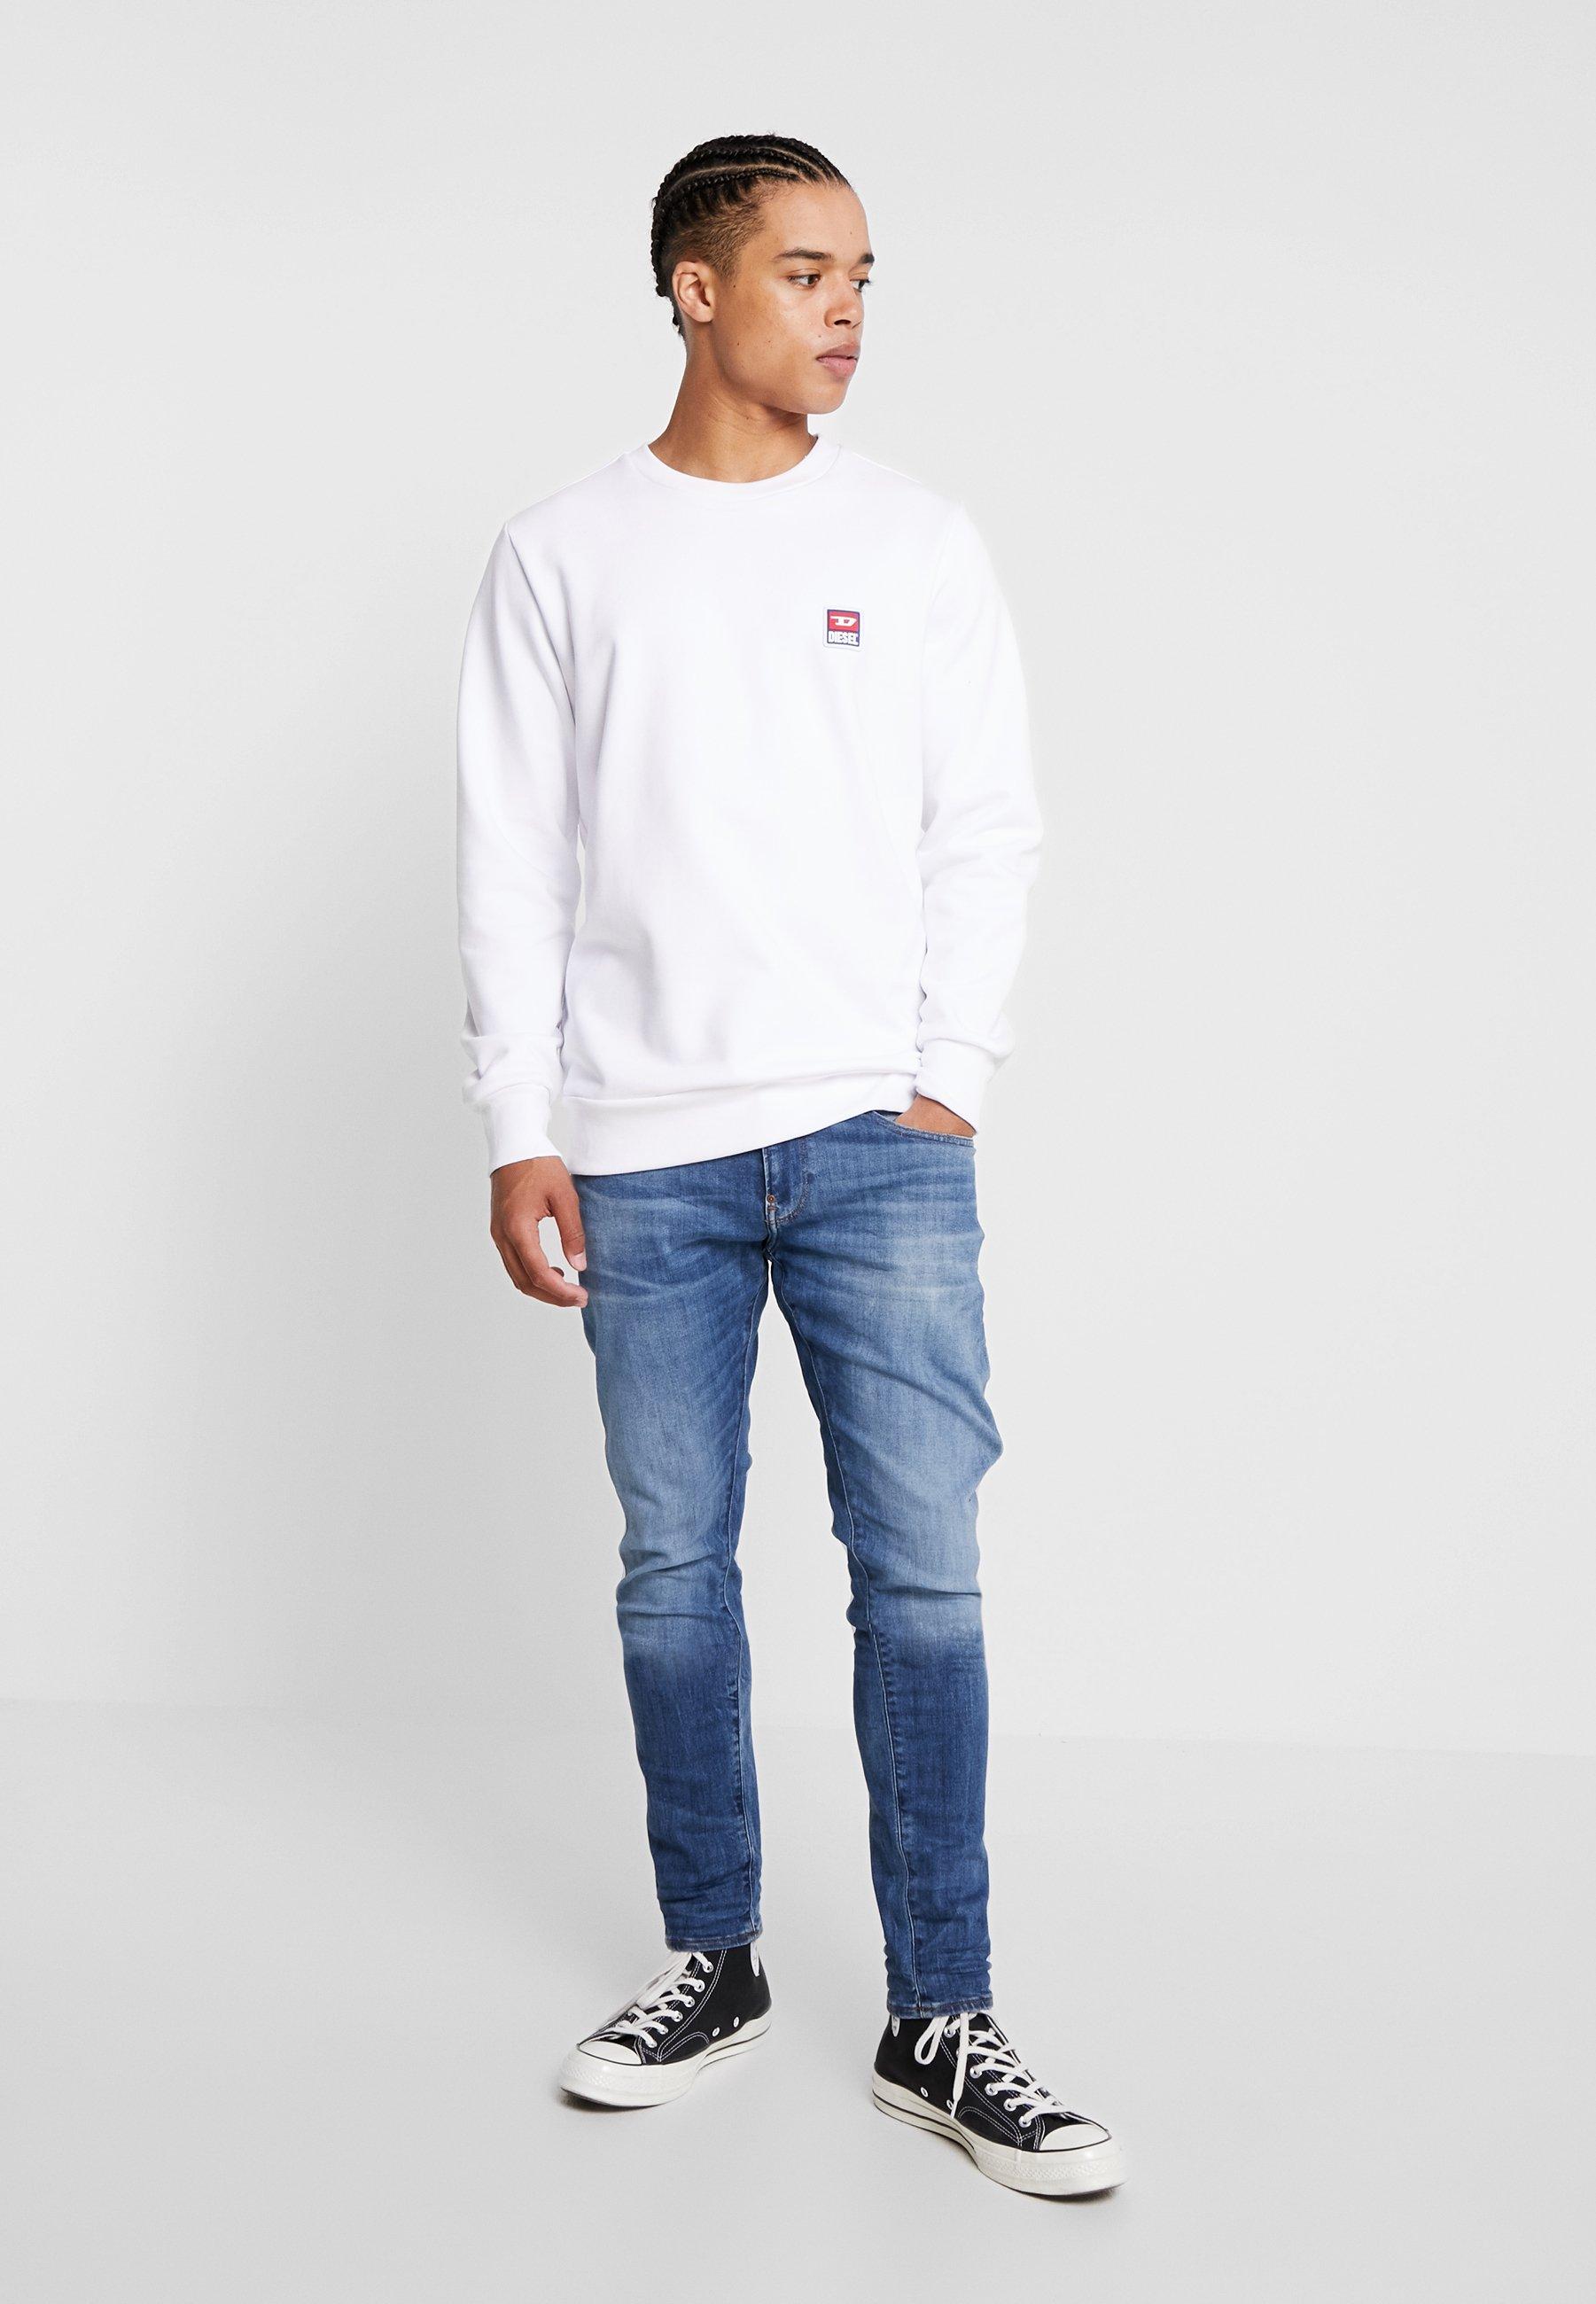 G-star Revend Skinny - Jeans Slim Fit Elto Superstretch Medium Indigo Aged